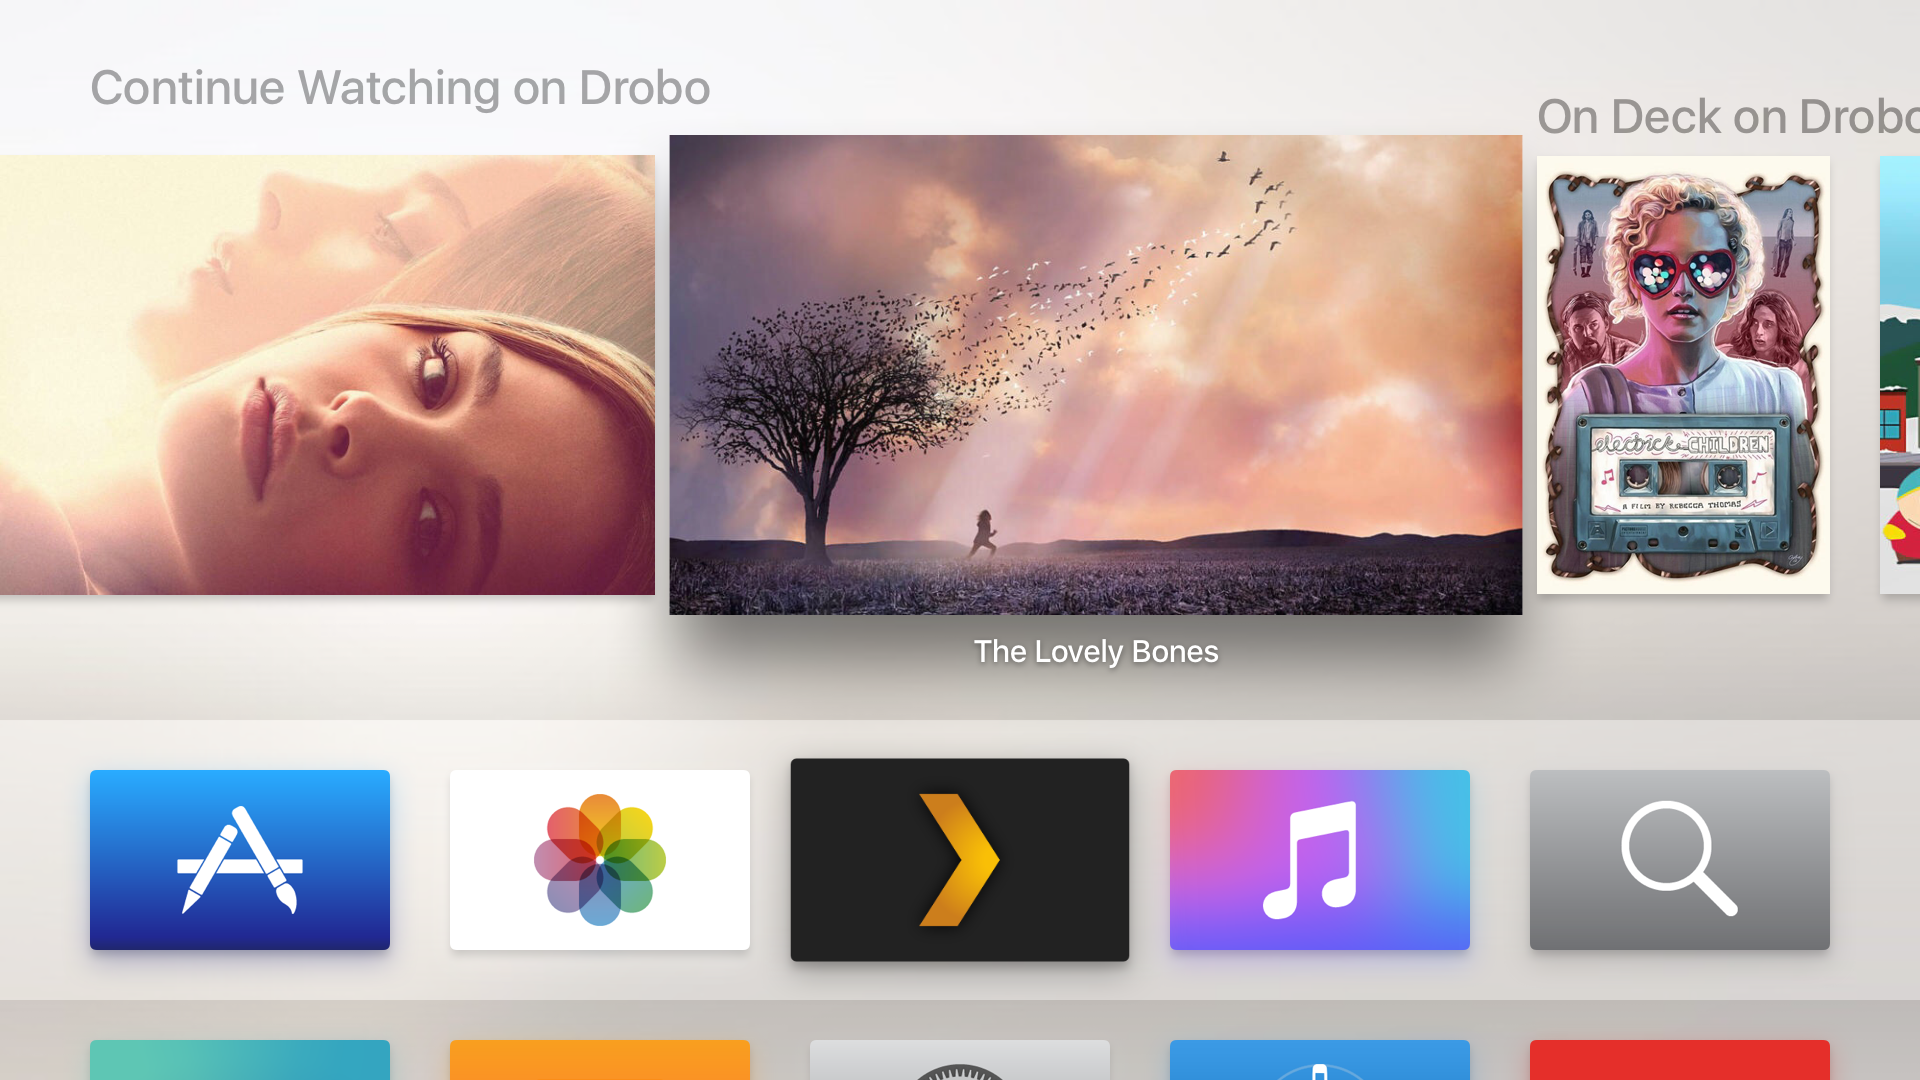 Review: Plex for the Apple TV (4th gen)